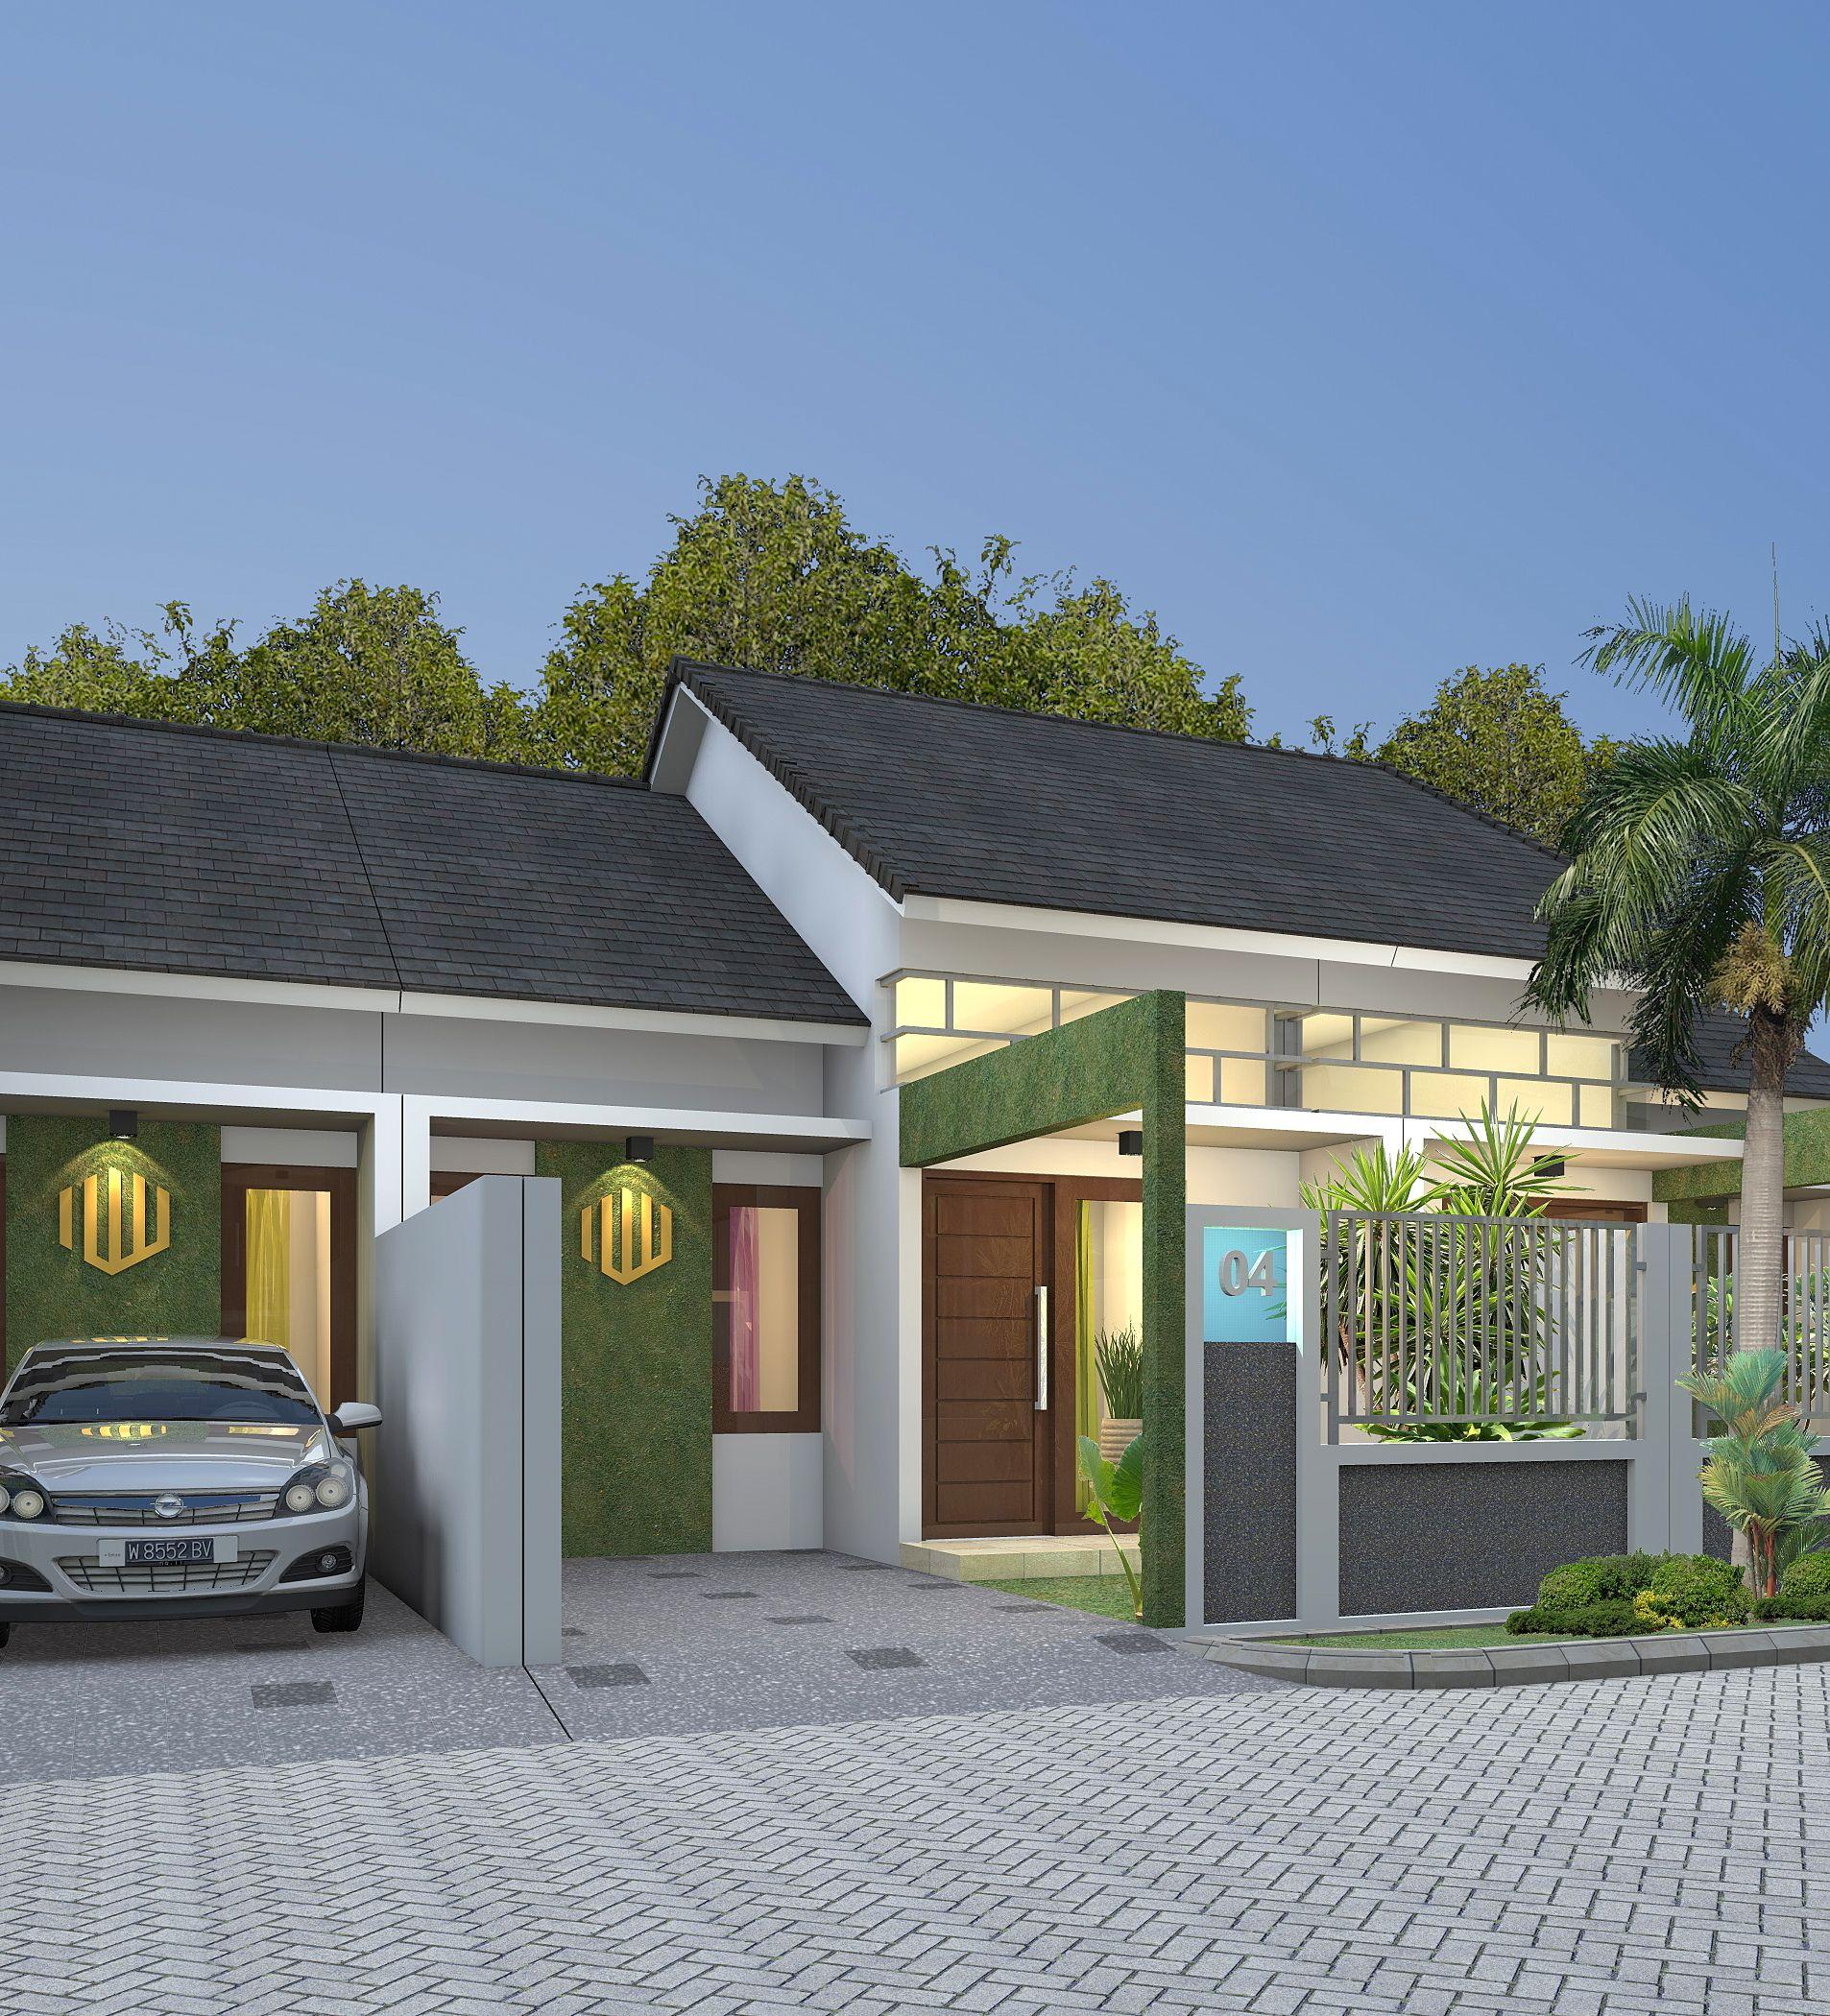 Desain Rumah Minimalis Perumahan Samara Residence Type